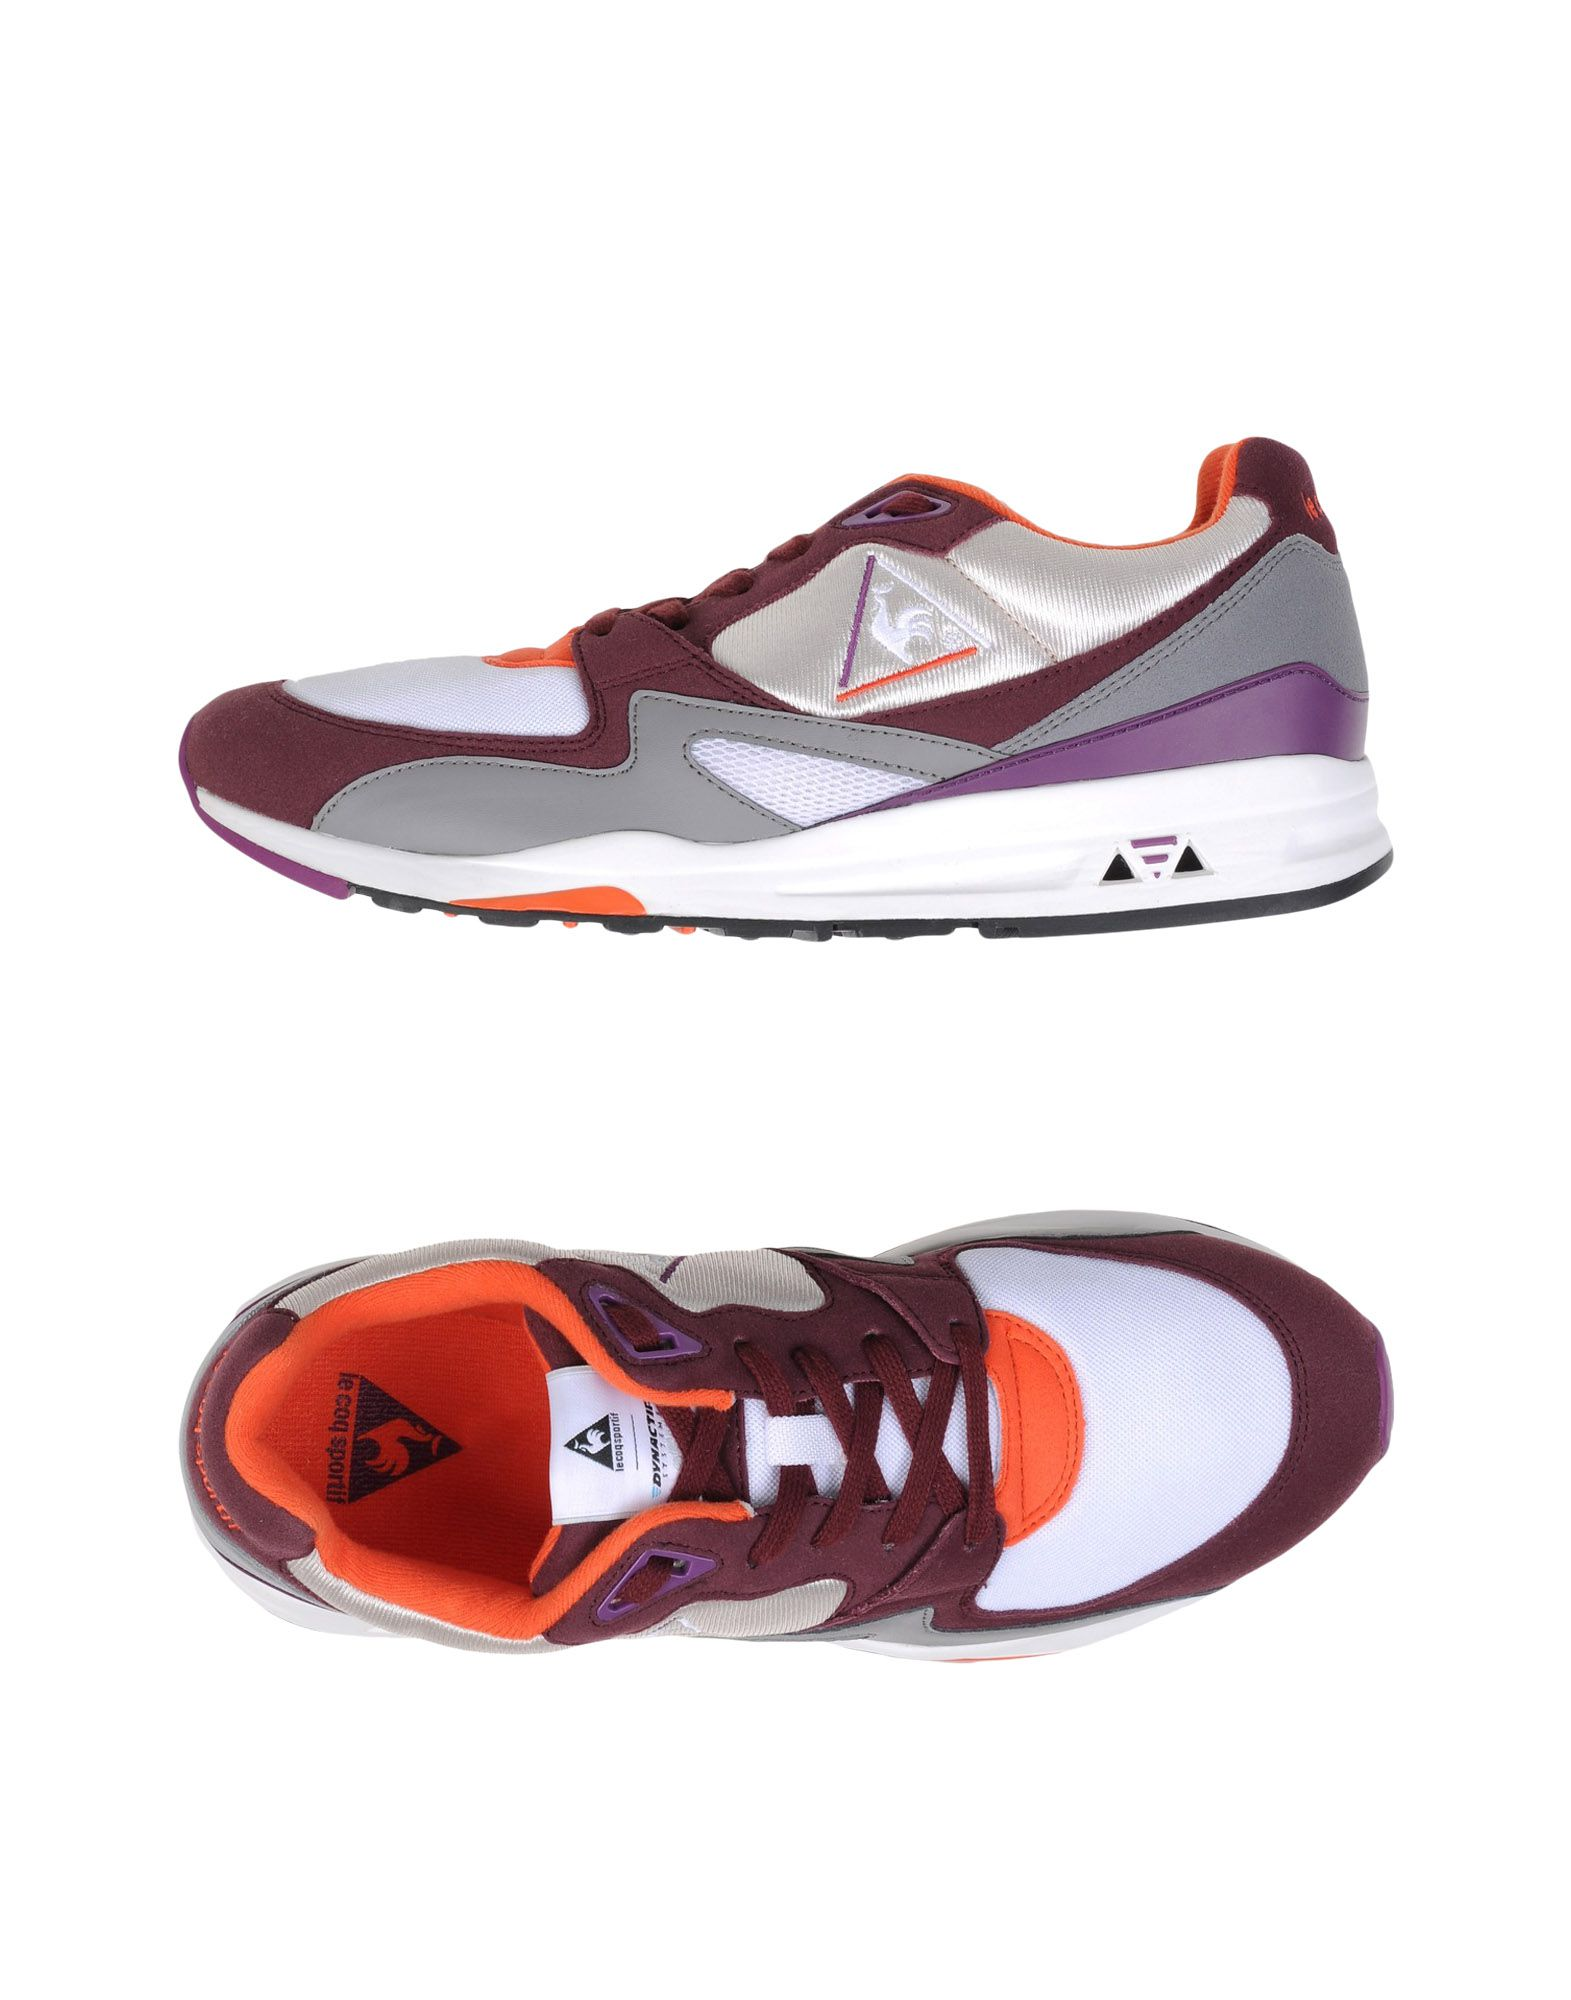 Rabatt echte Schuhe Le Coq Sportif Lcs R 800 90'S  11115916AD